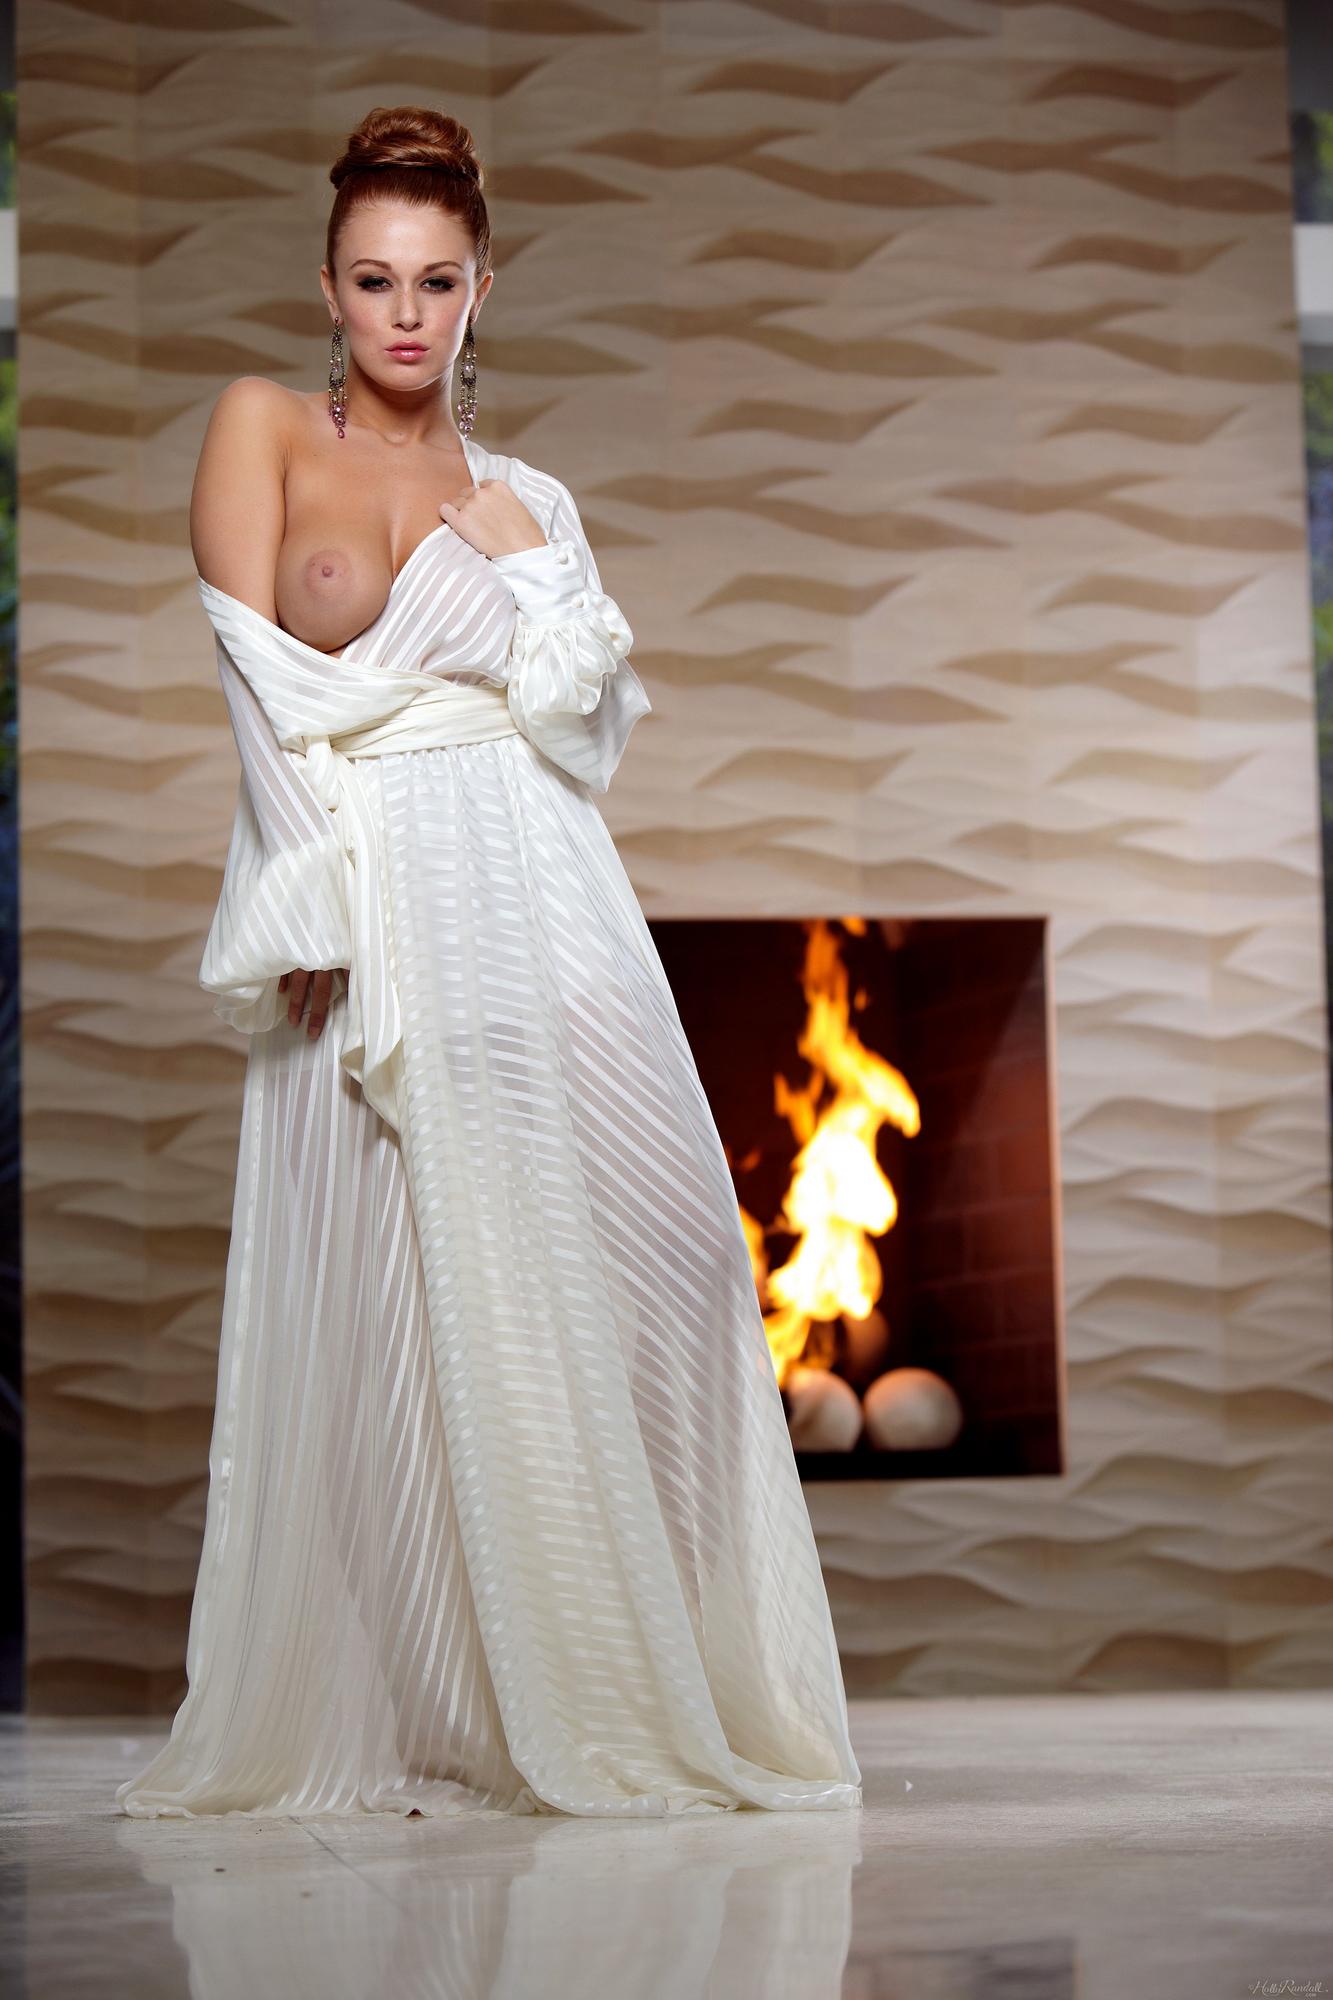 leanna-decker-nude-fireplace-redhead-hollyrandall-03